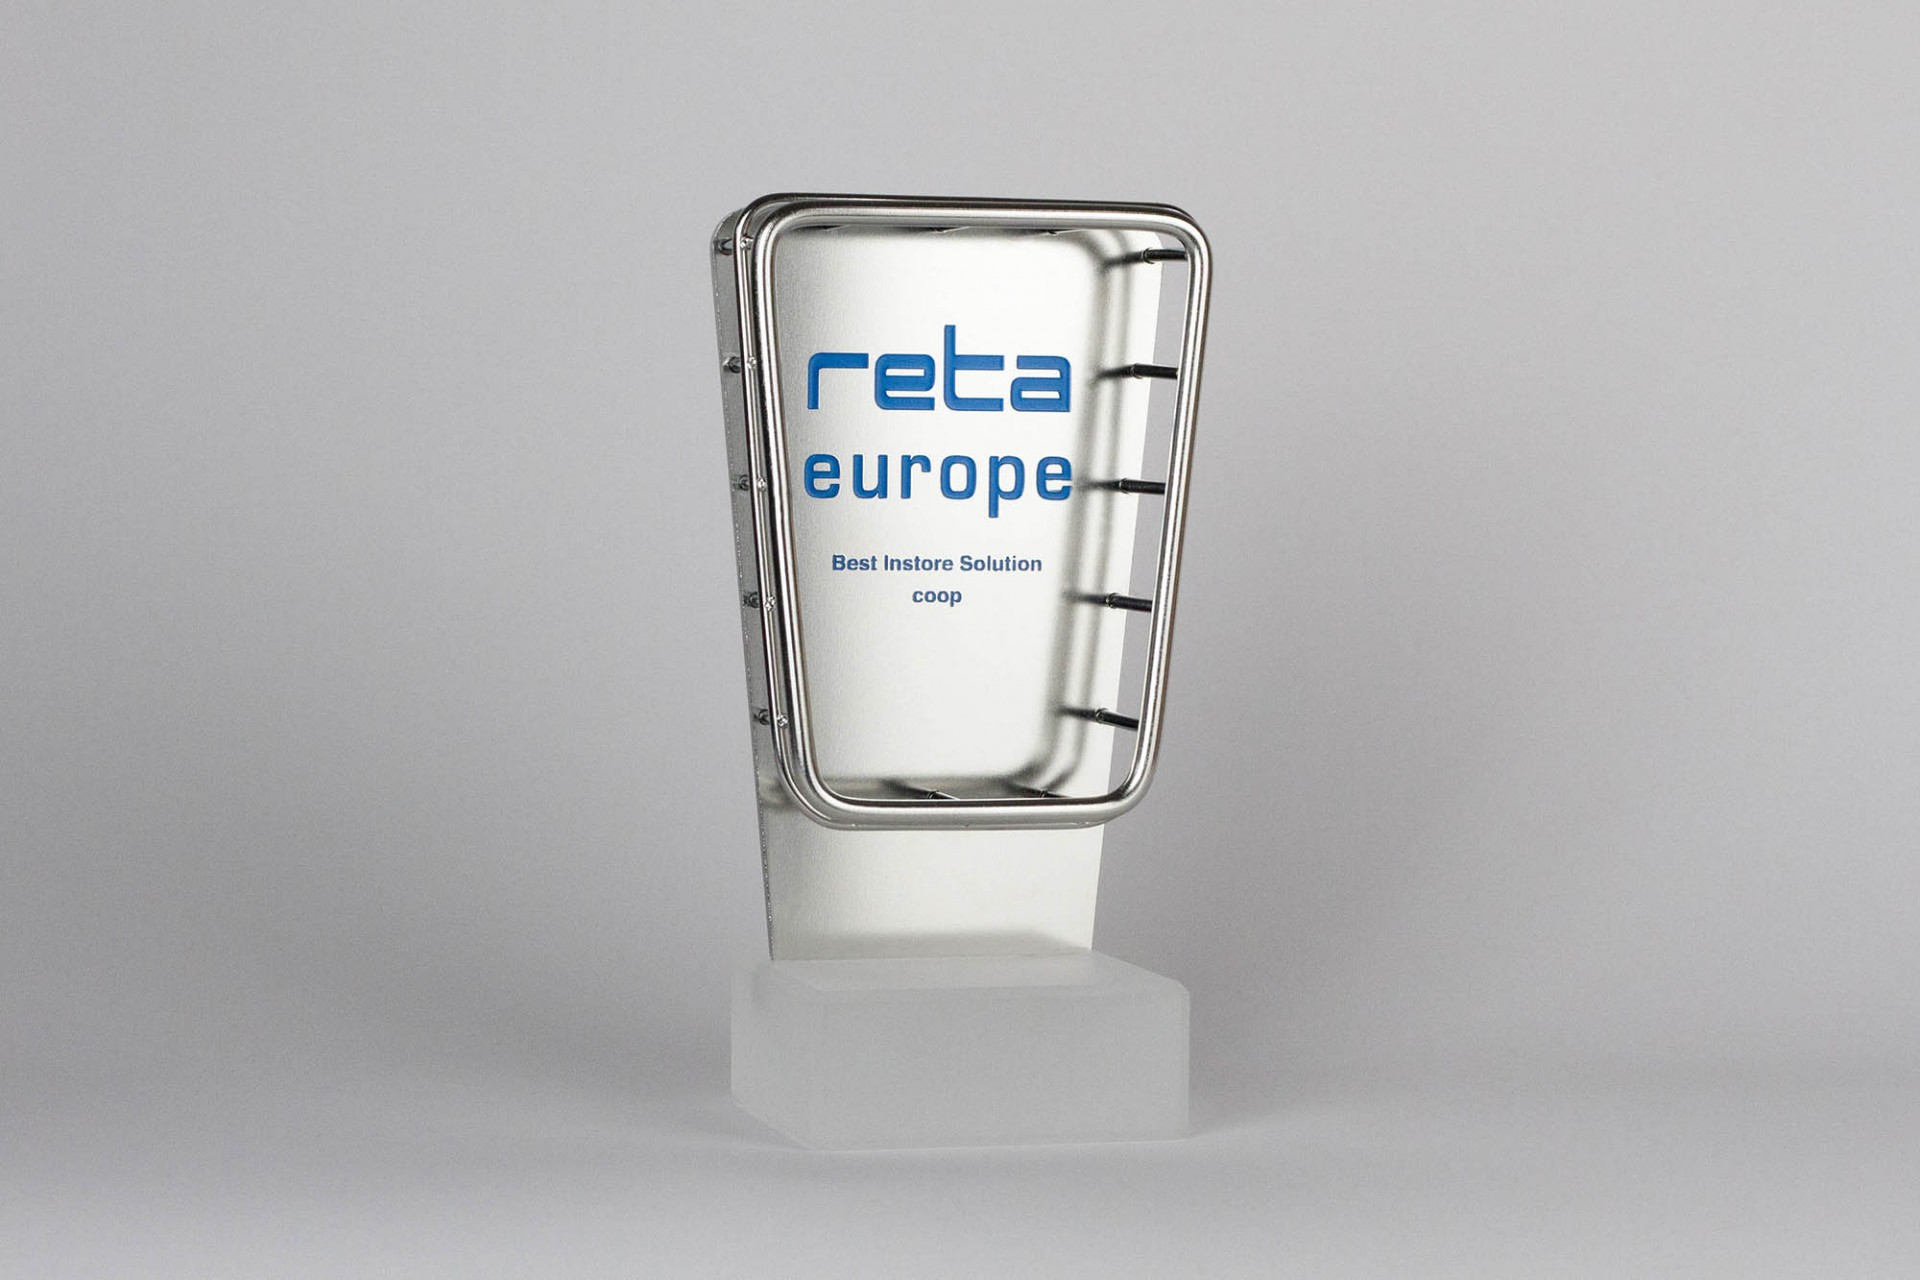 Büro Hyngar reta europe award für das EHI Retail Institute